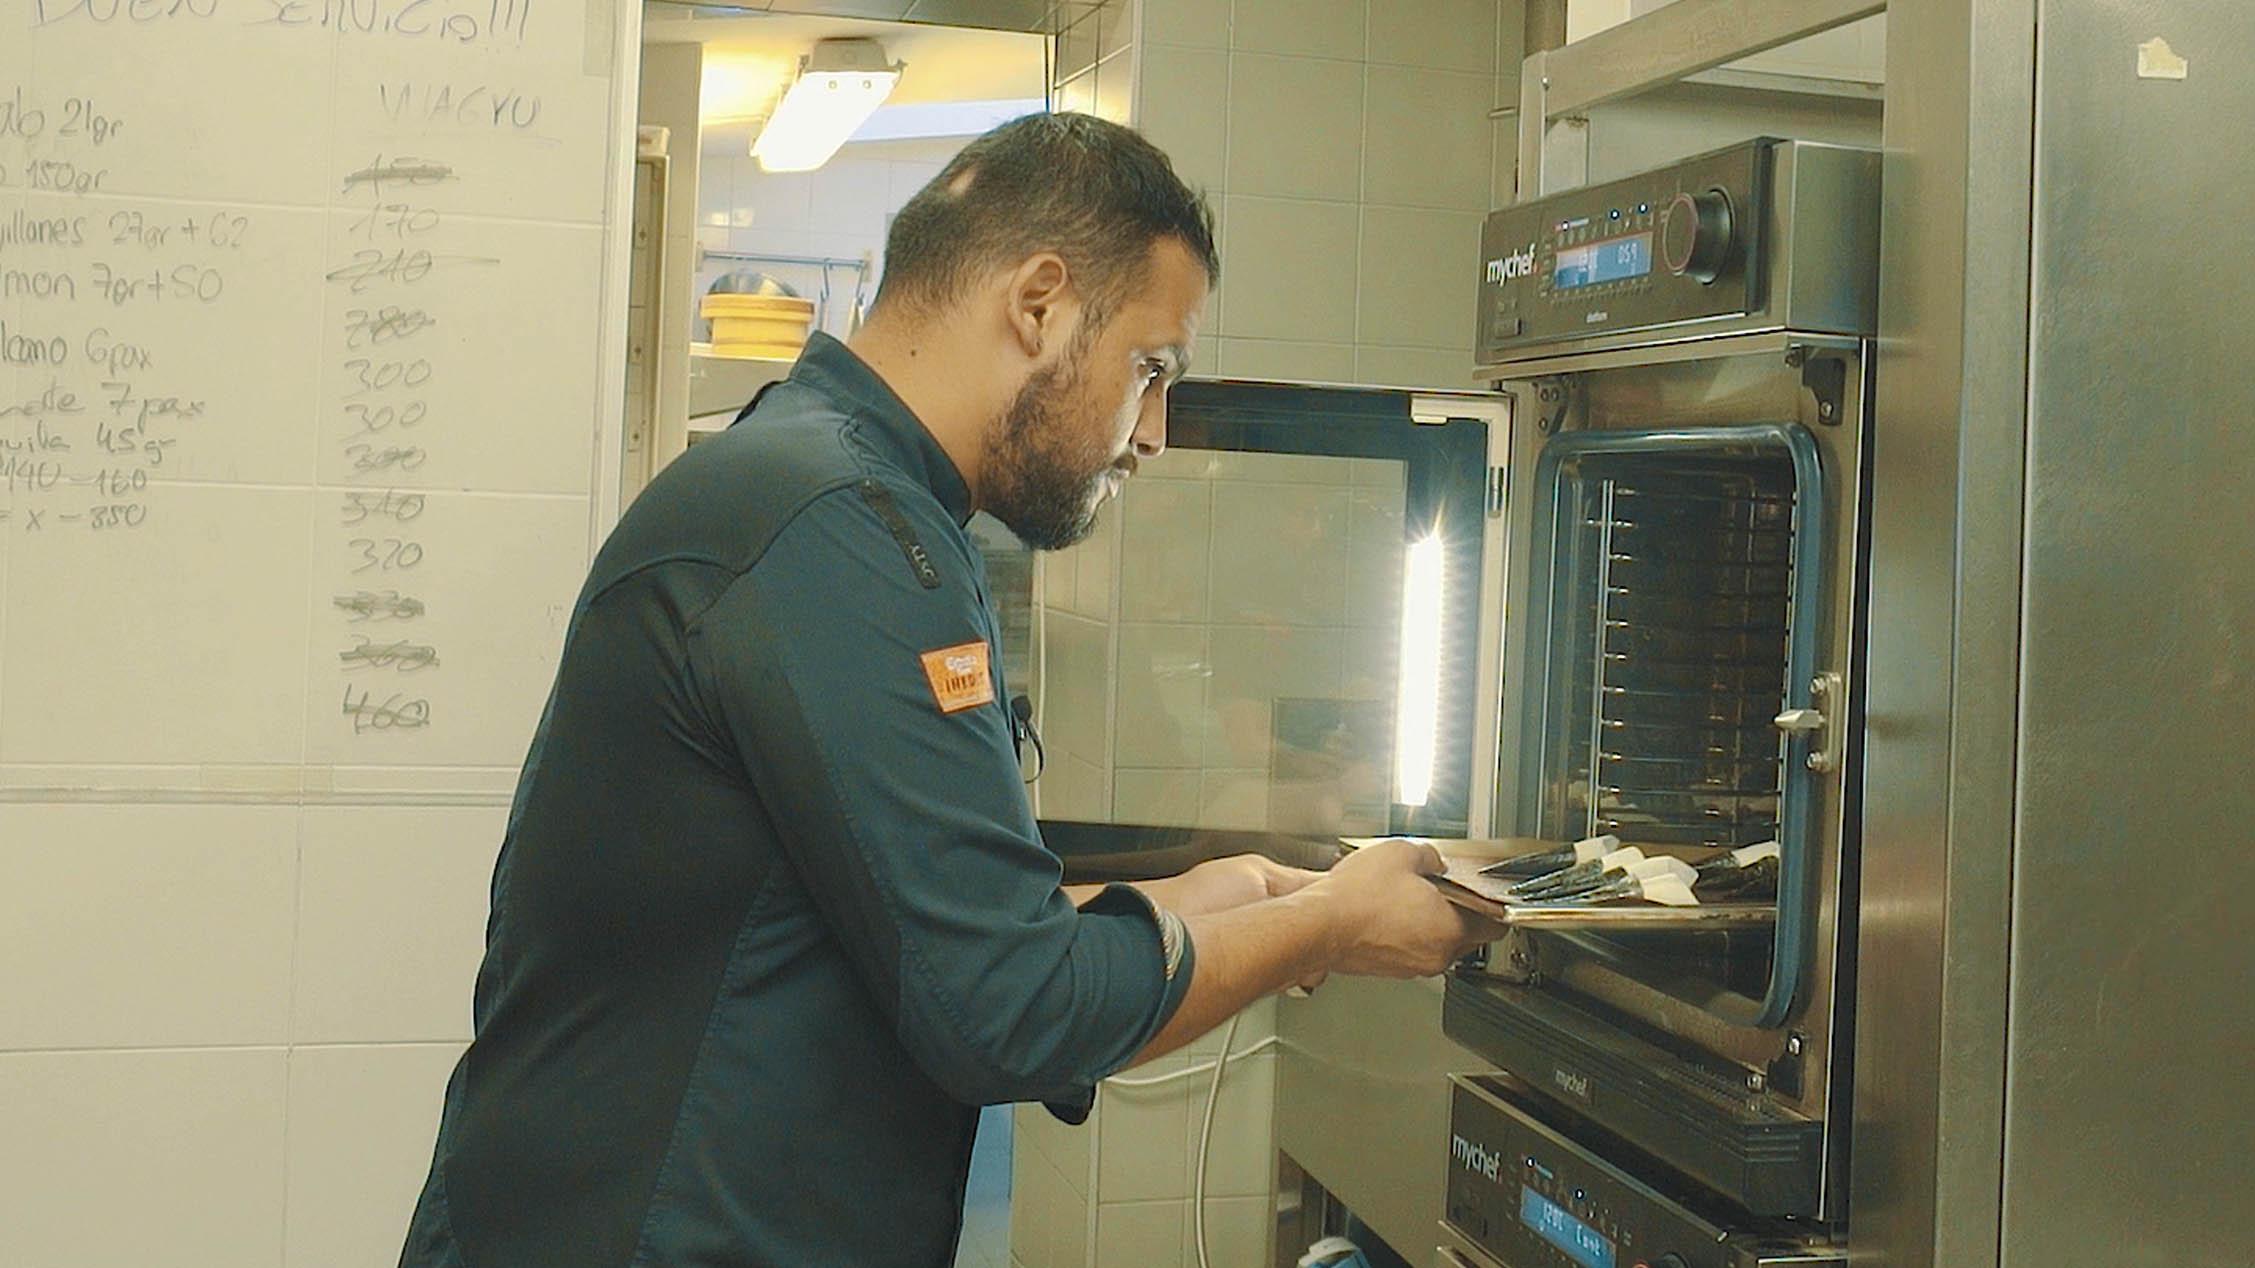 Mychef mychef oven distform pakta <span>Historia de éxito de</span> <br>JORGE MUÑOZ  Mychef   mychef oven distform pakta